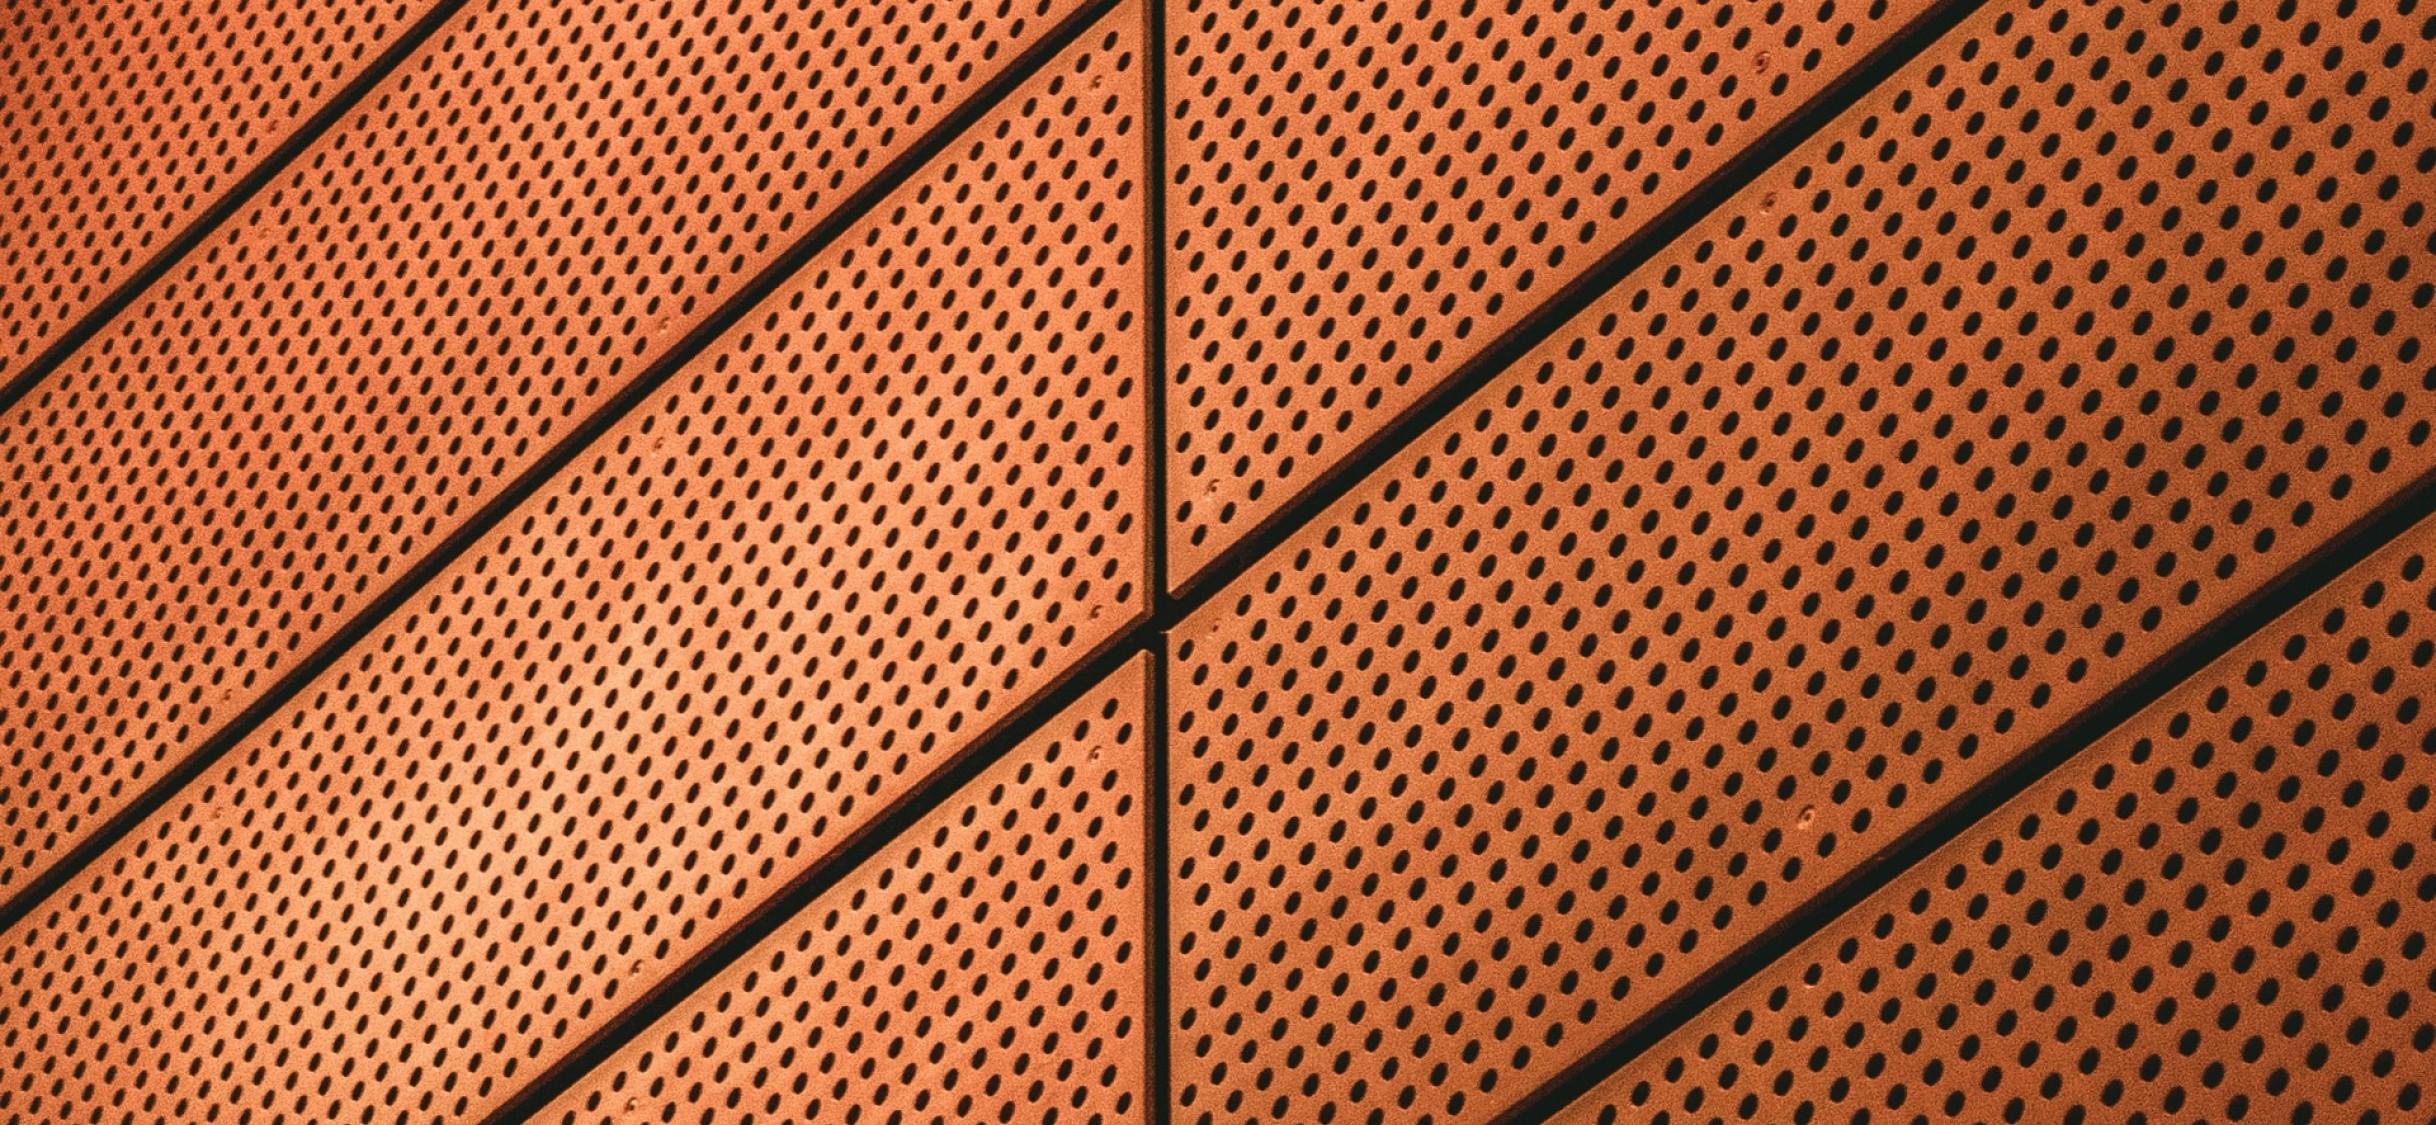 Black Dots On Surface Hd Wallpaper Iphone X Hd Wallpaper